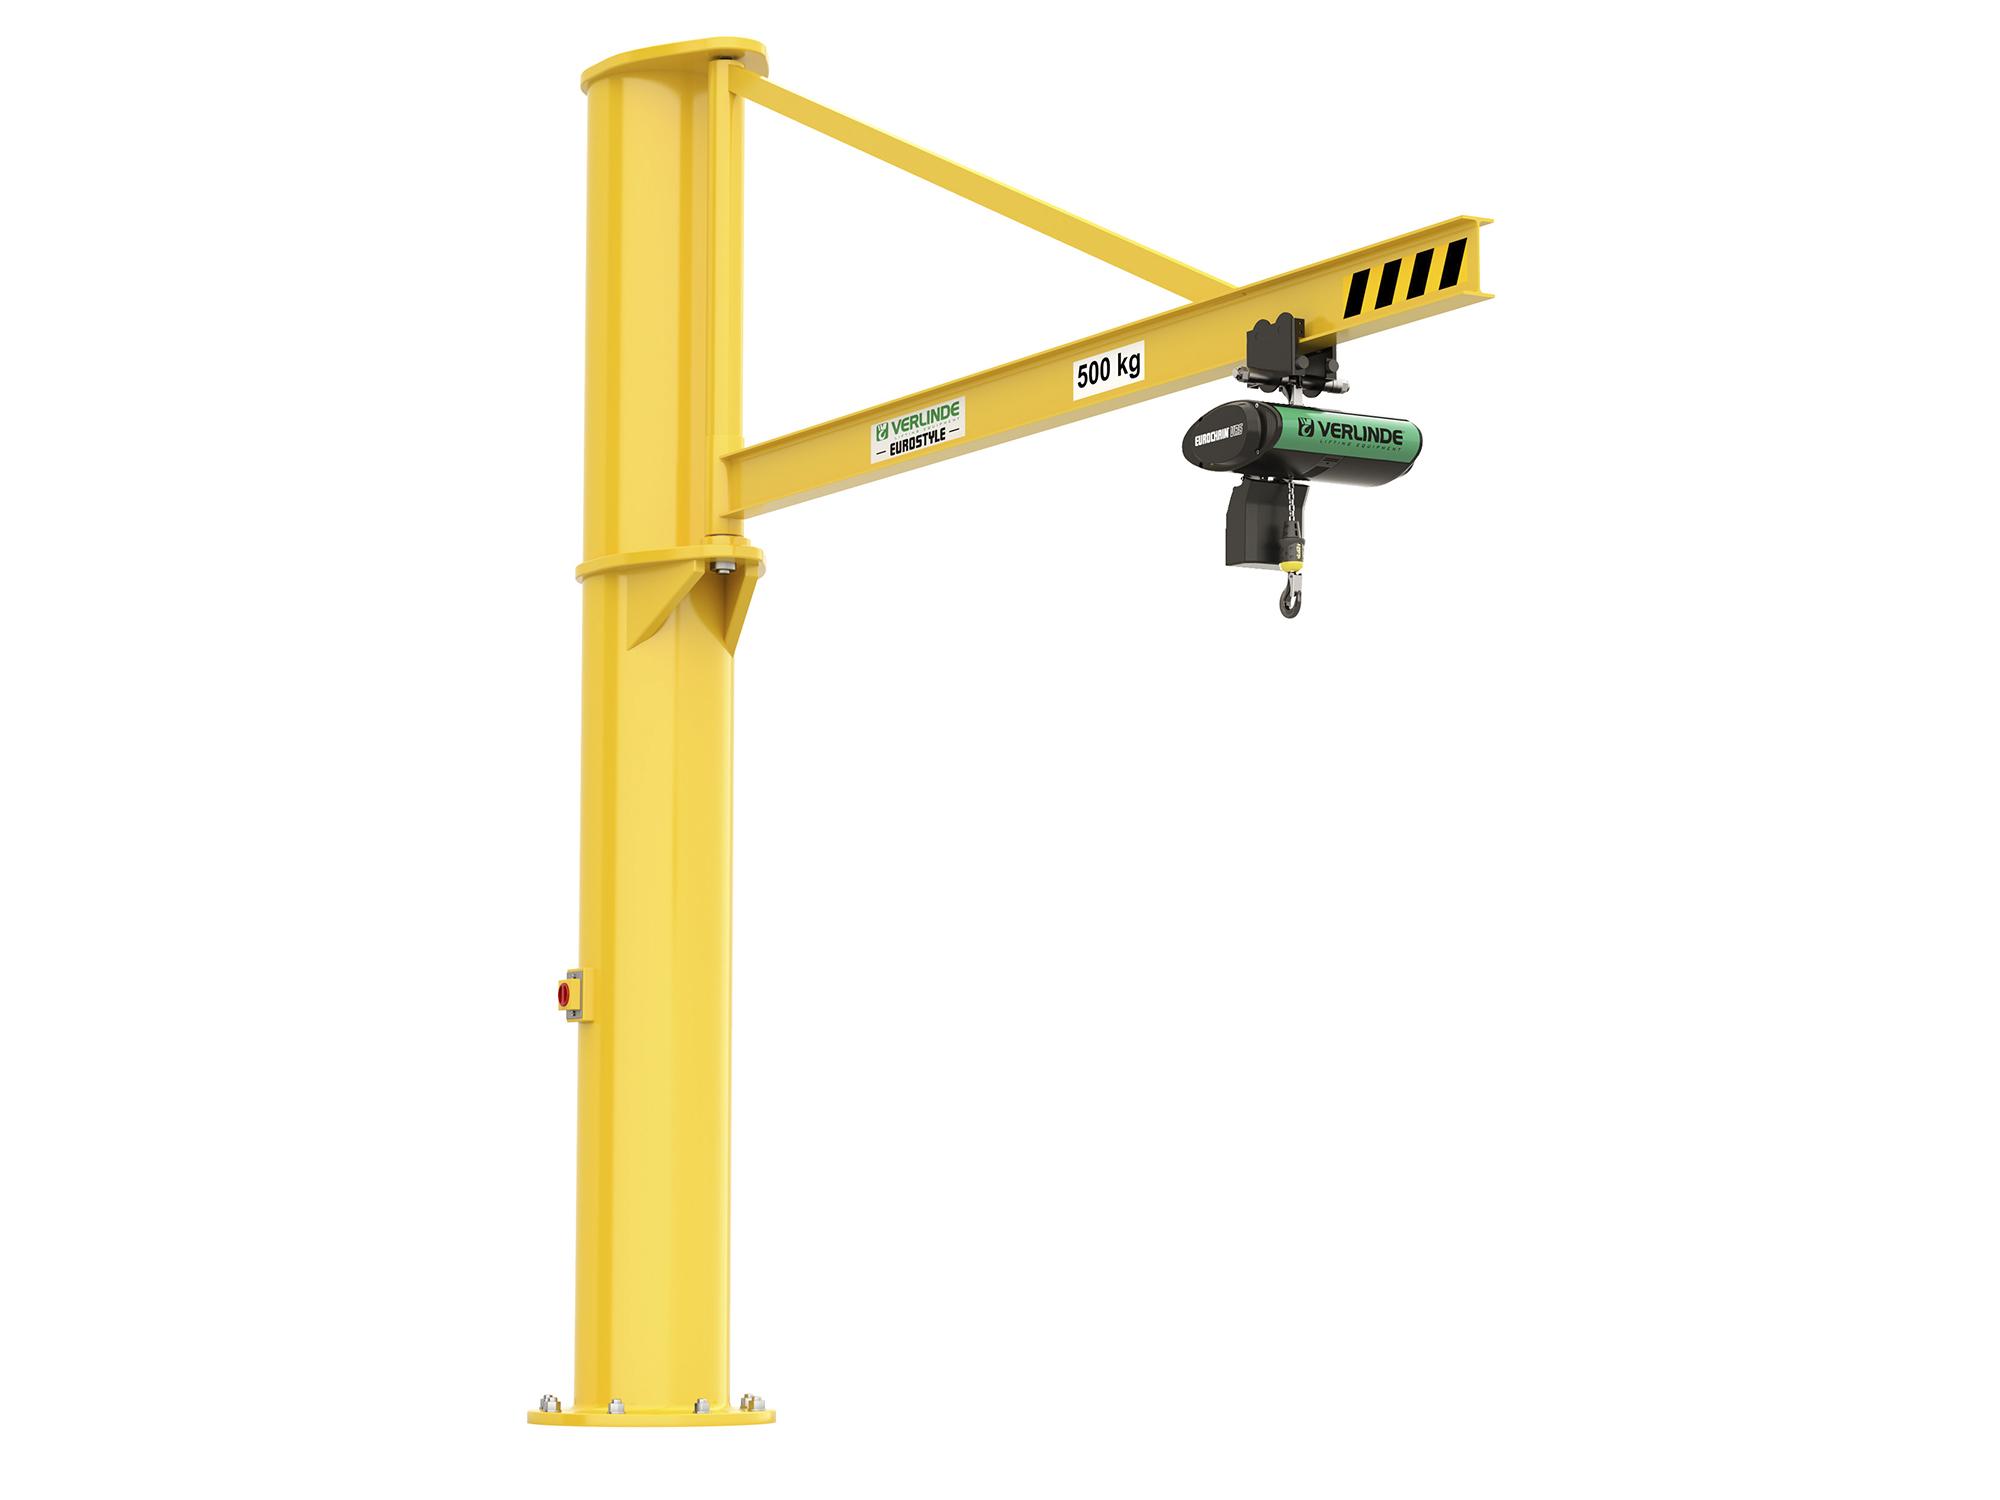 Jib Cranes Images : Vft free standing floor mounted overbraced jib crane